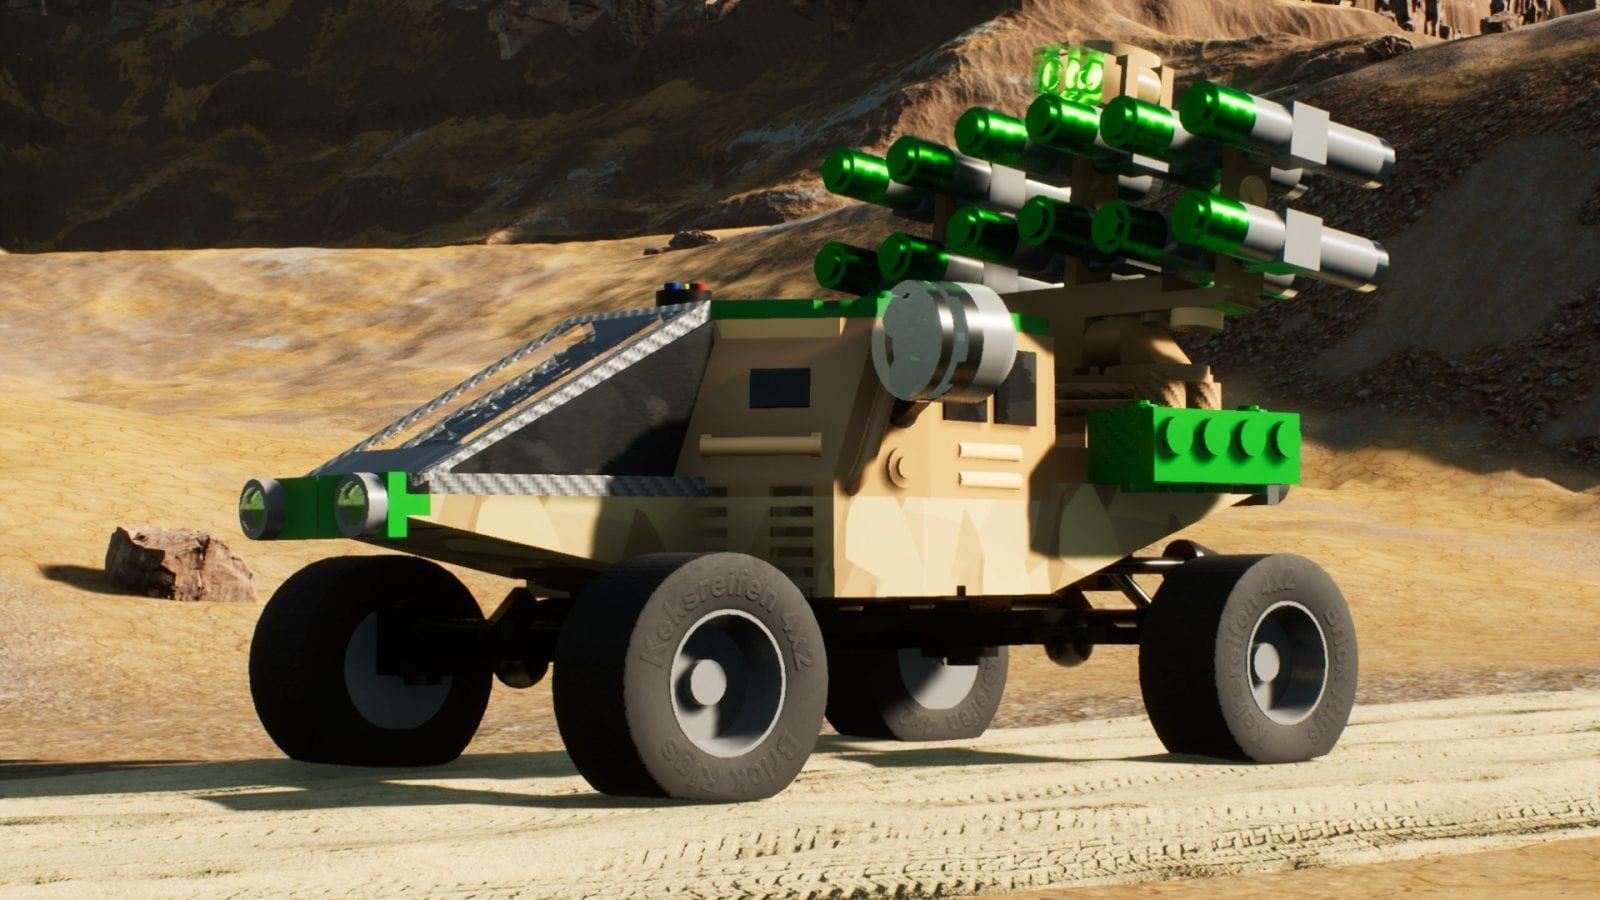 GLA-Rocket-Buggy-Mod-for-Brick-Rigs-5.jpg